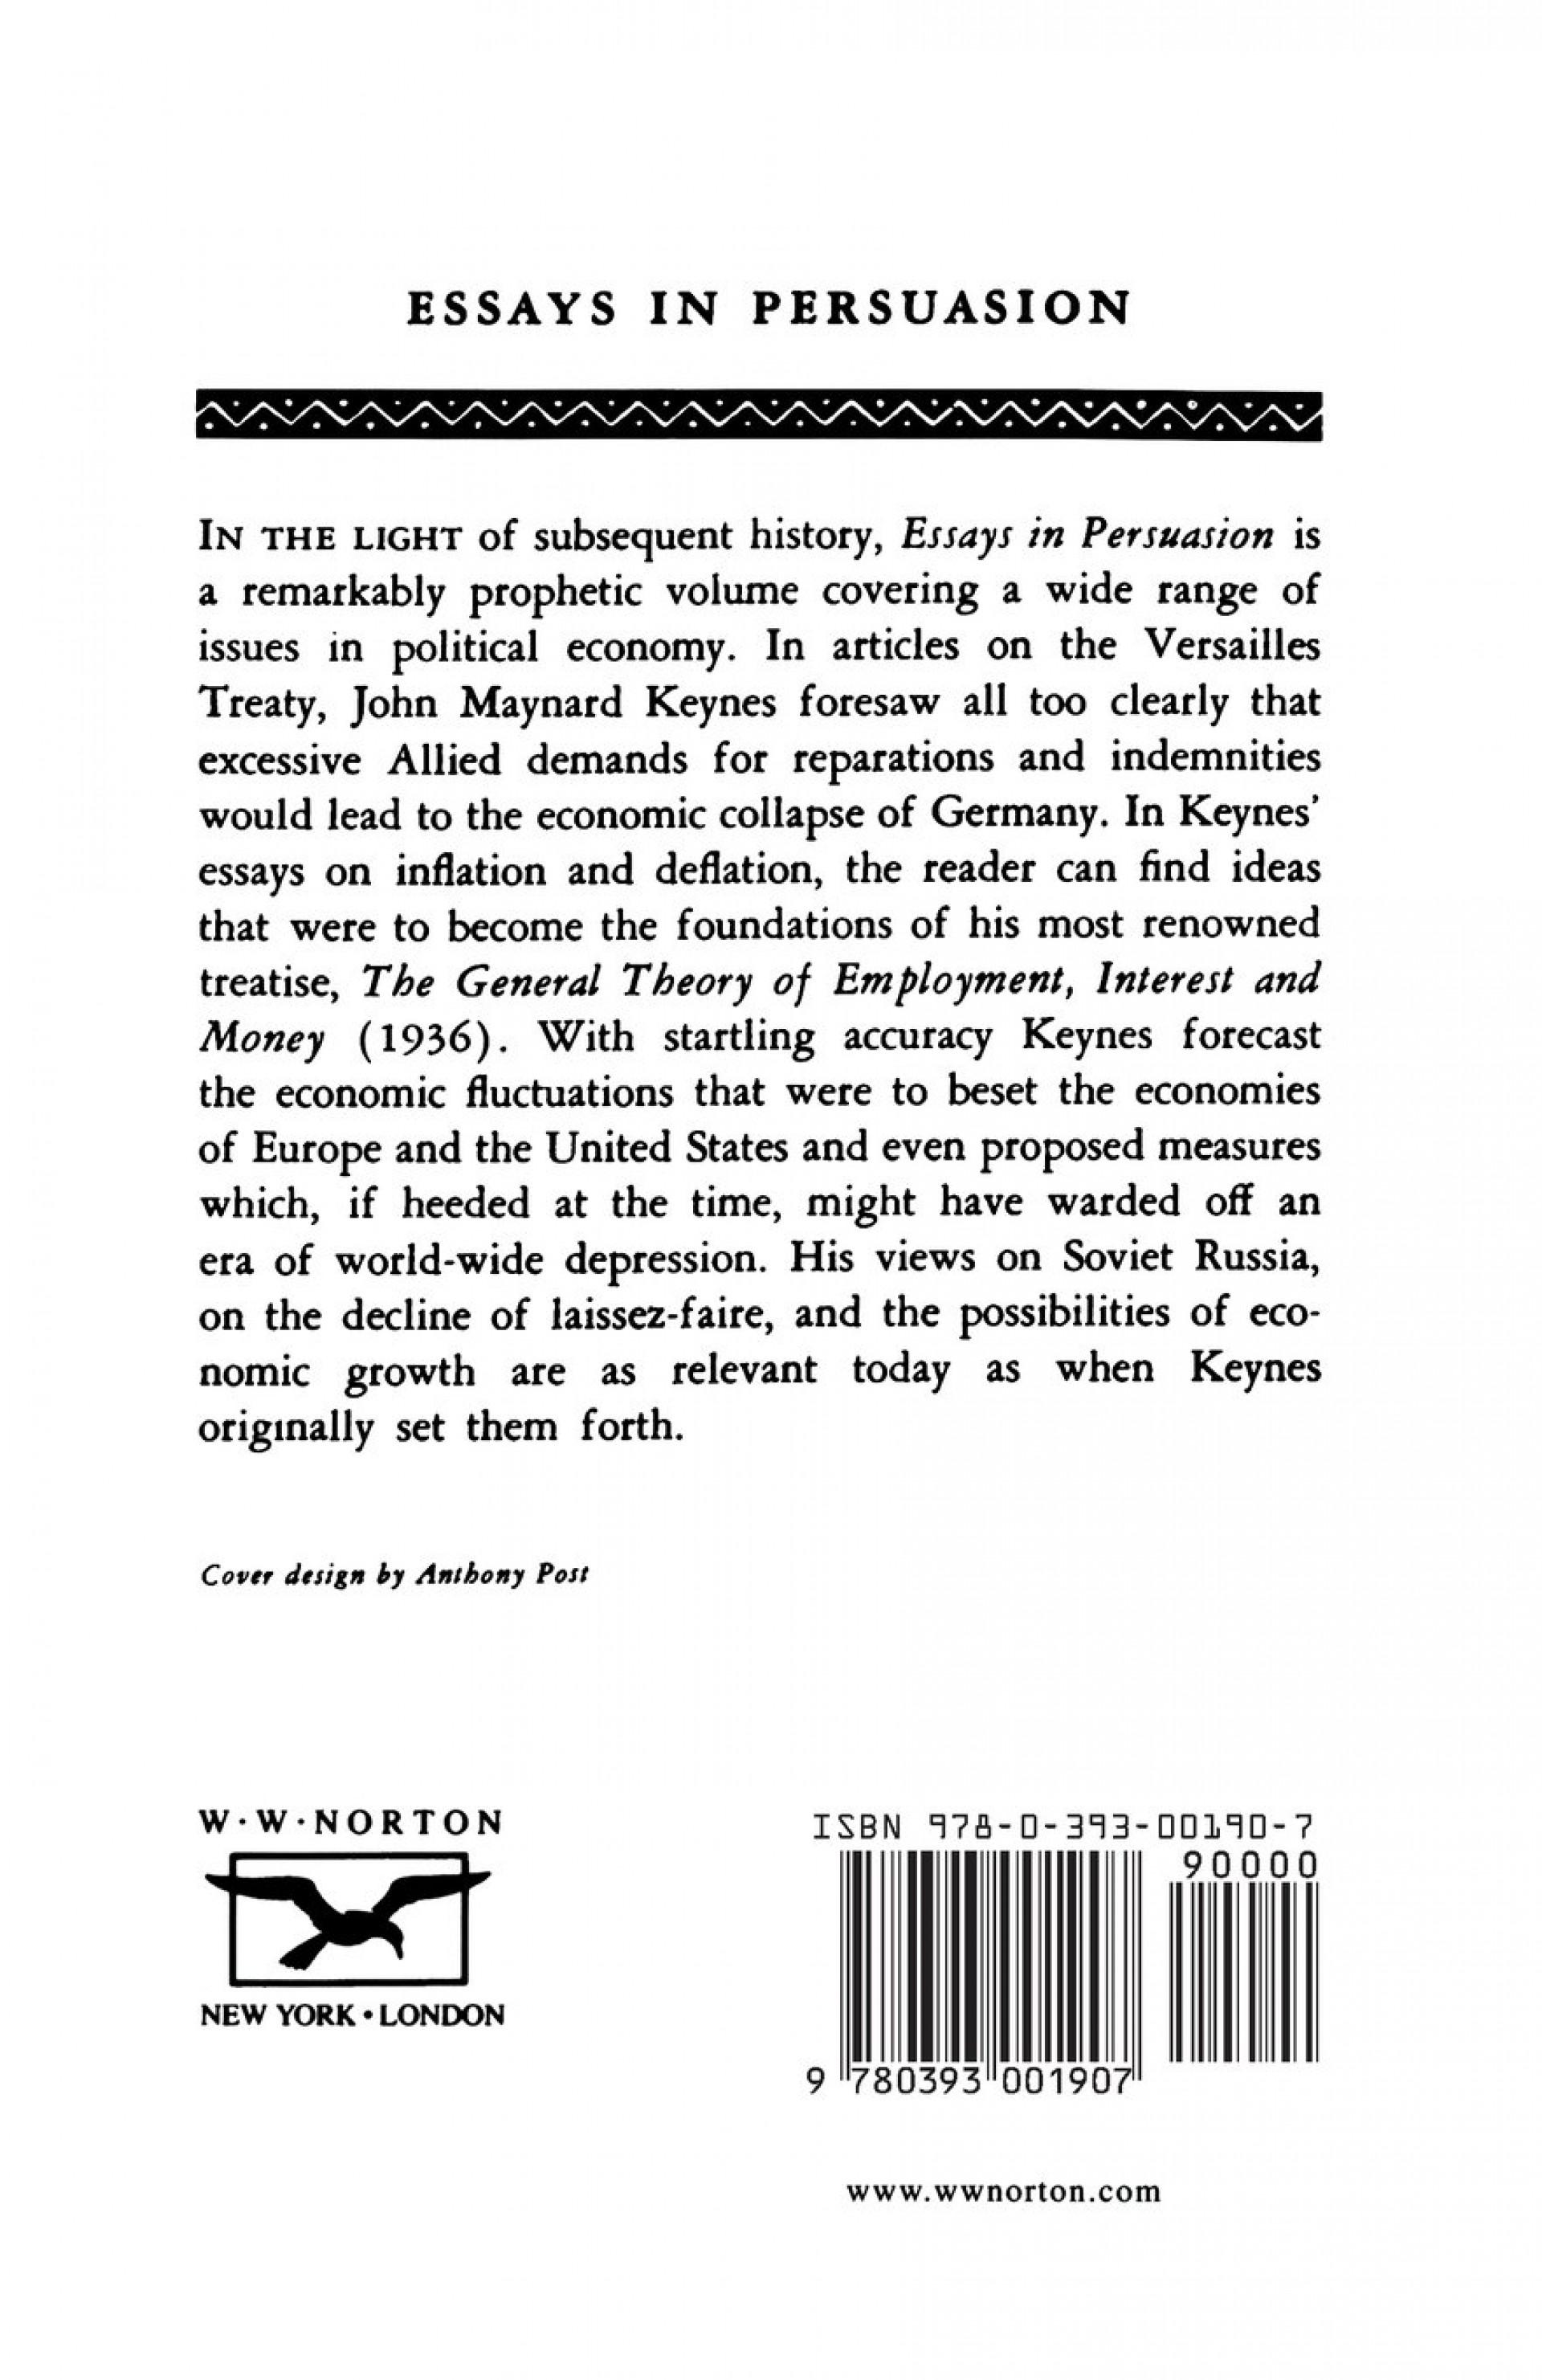 011 Essays In Persuasion 71ahgmsw 0l Essay Remarkable Audiobook Pdf John Maynard Keynes Summary 1920